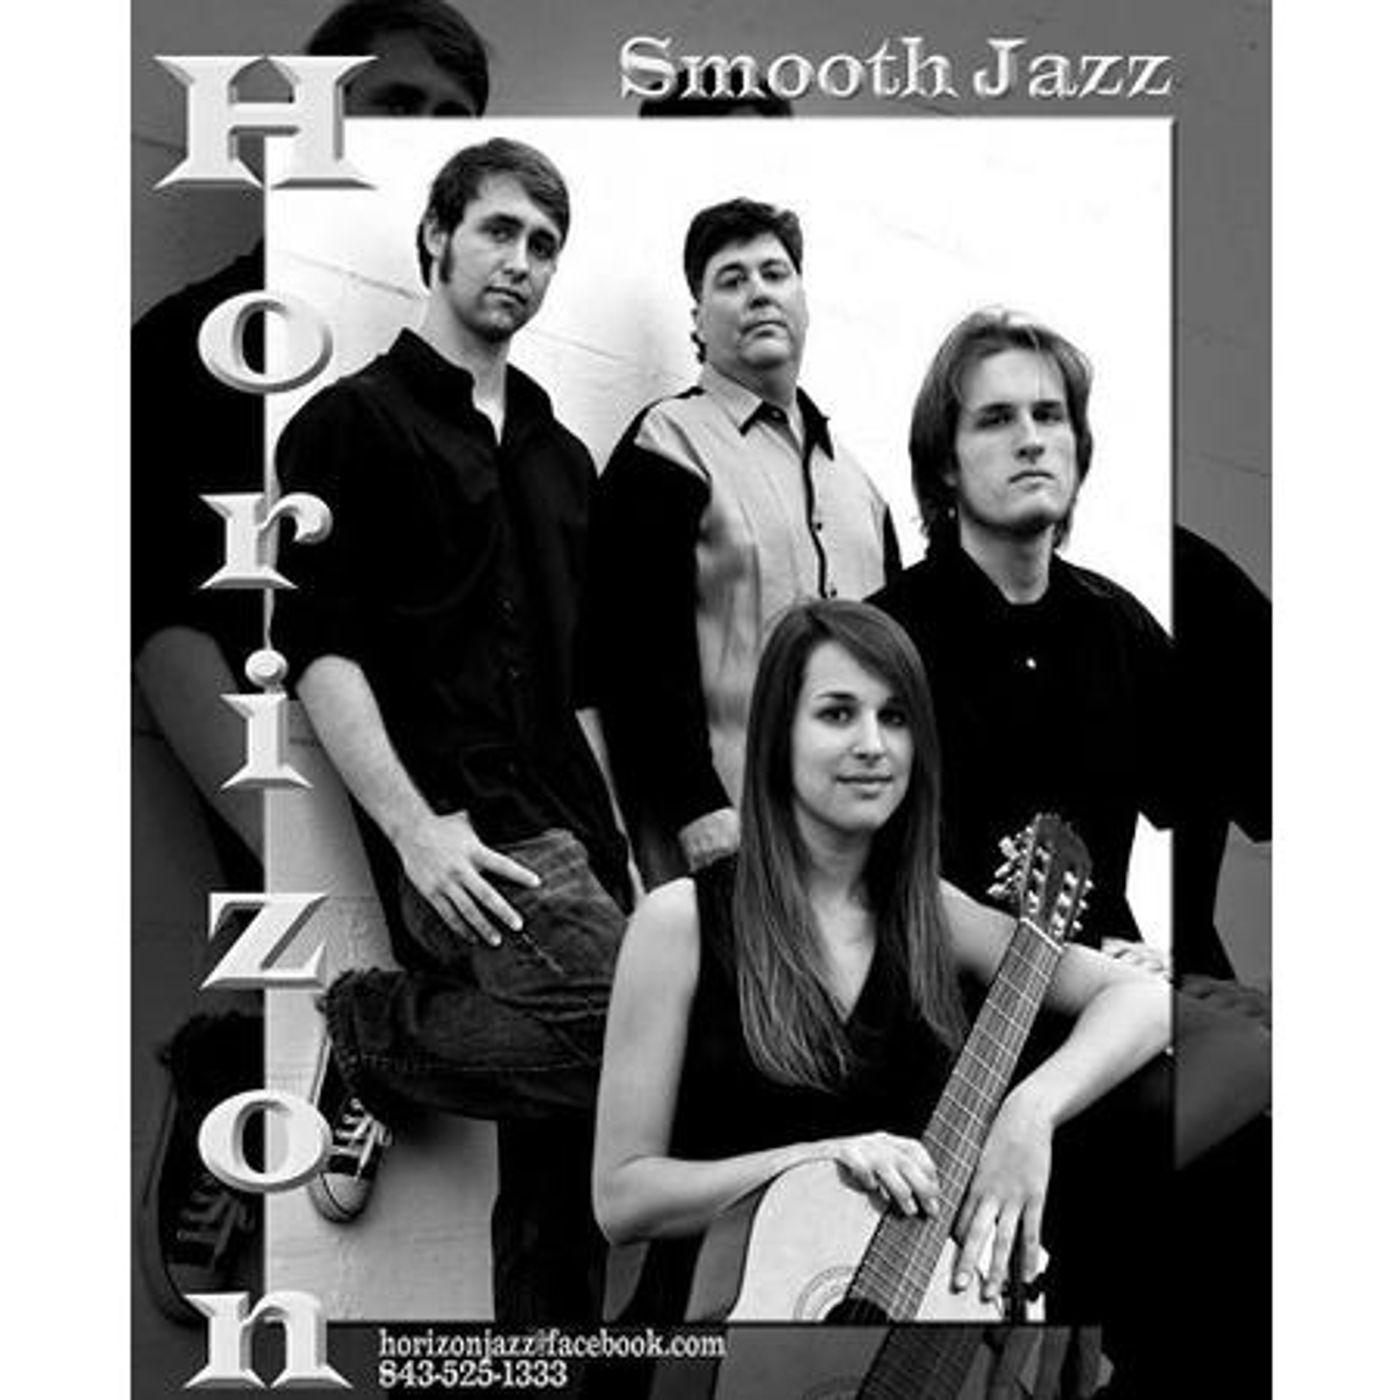 Horizon's Jim Bachety Joins Us On ITNS Radio